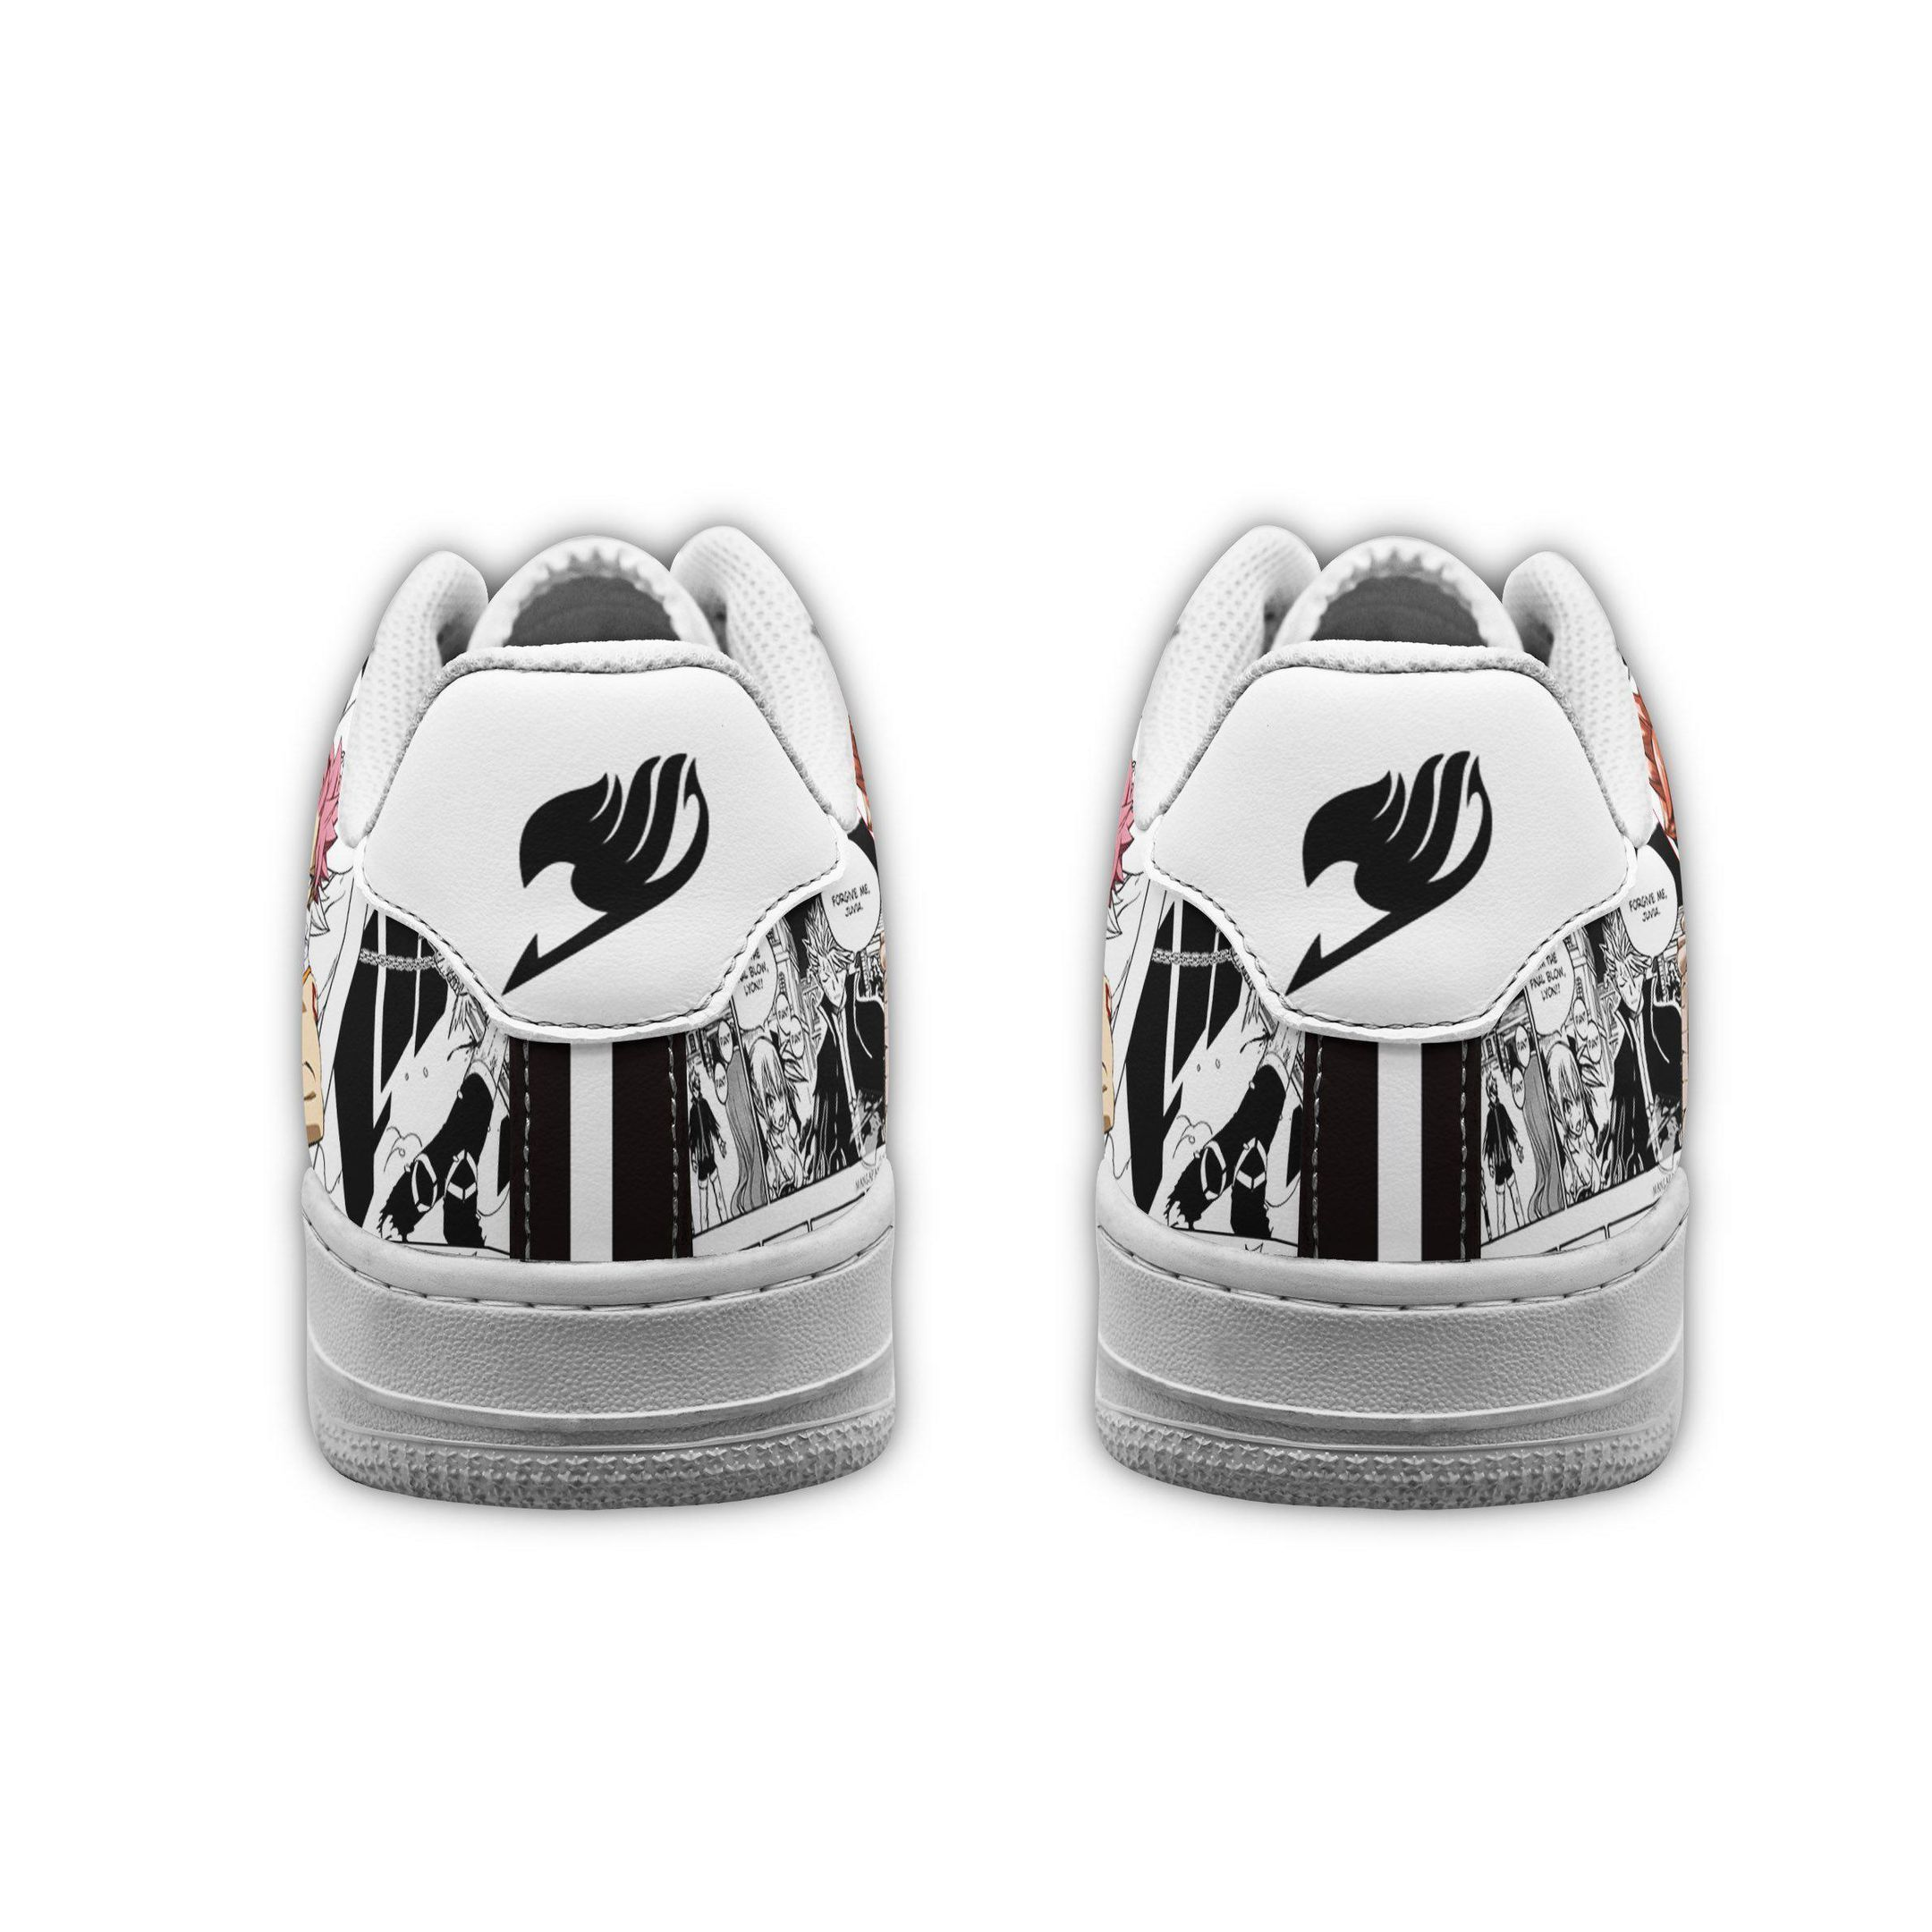 Fairy Tail Air Shoes Manga Anime Shoes Fan Gift Idea GO1012